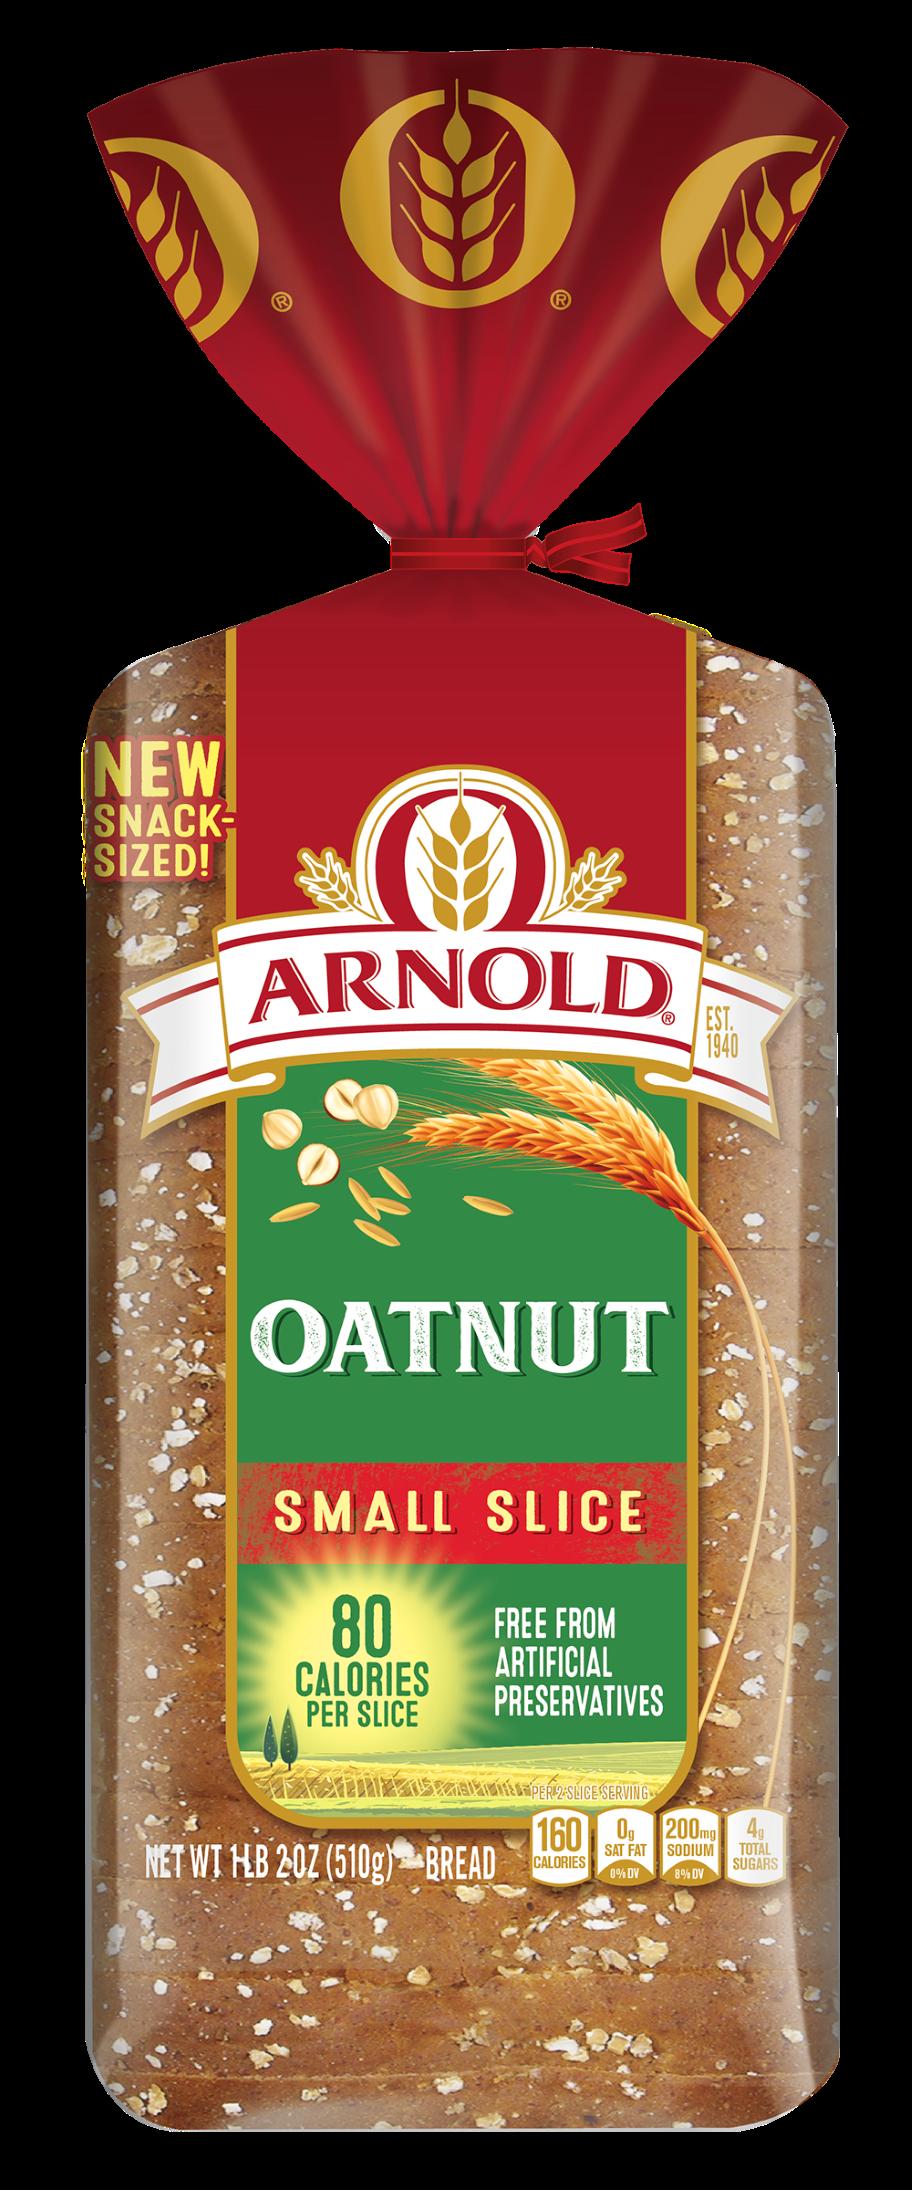 Arnold Small Slice Oatnut 18oz Packaging